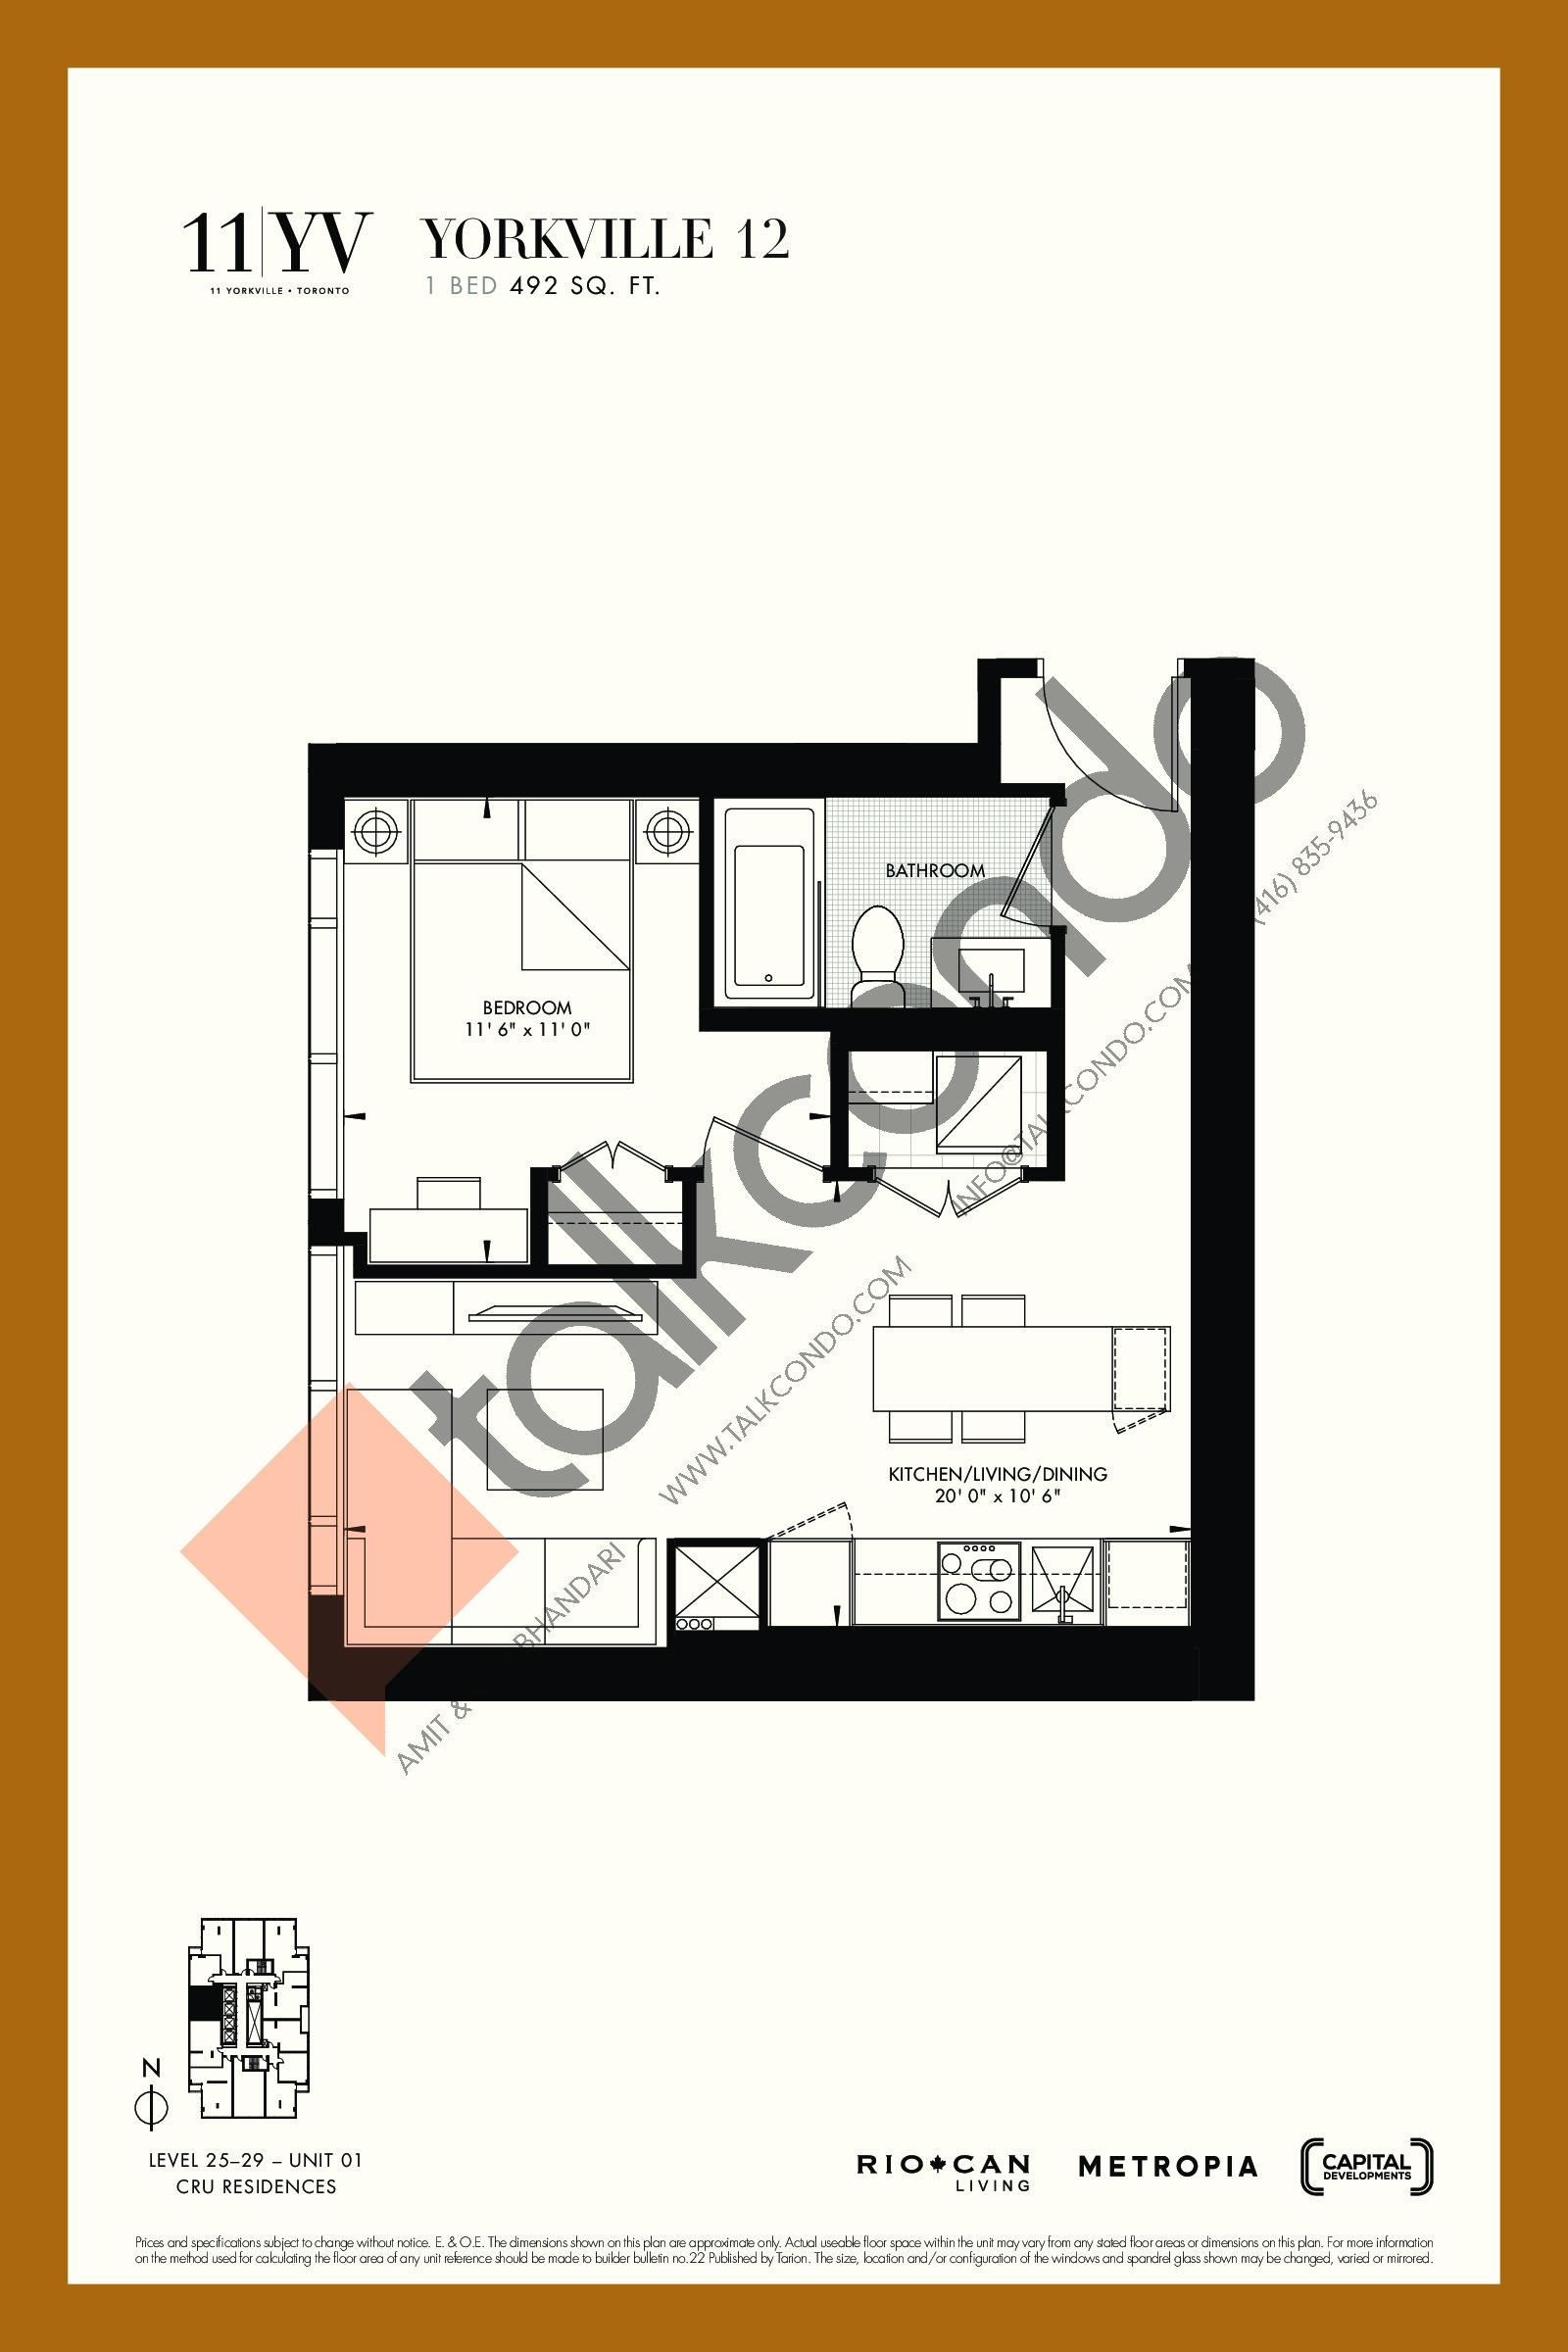 Yorkville 12 Floor Plan at 11YV Condos - 492 sq.ft